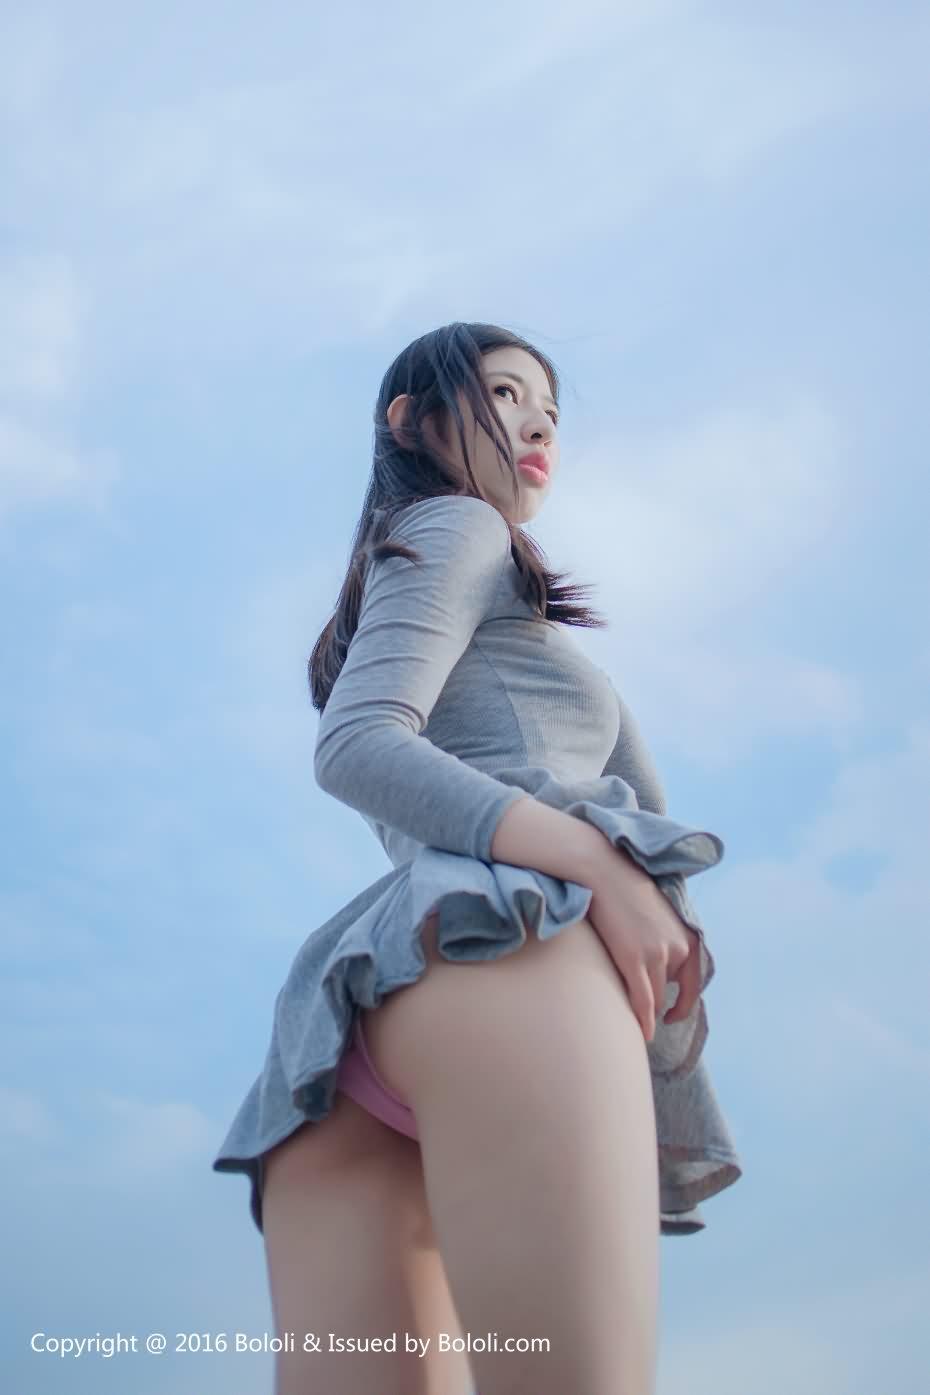 [BoLoli波萝社] Vol.103 郁郁 2017.08.16 [40+1P-128M]